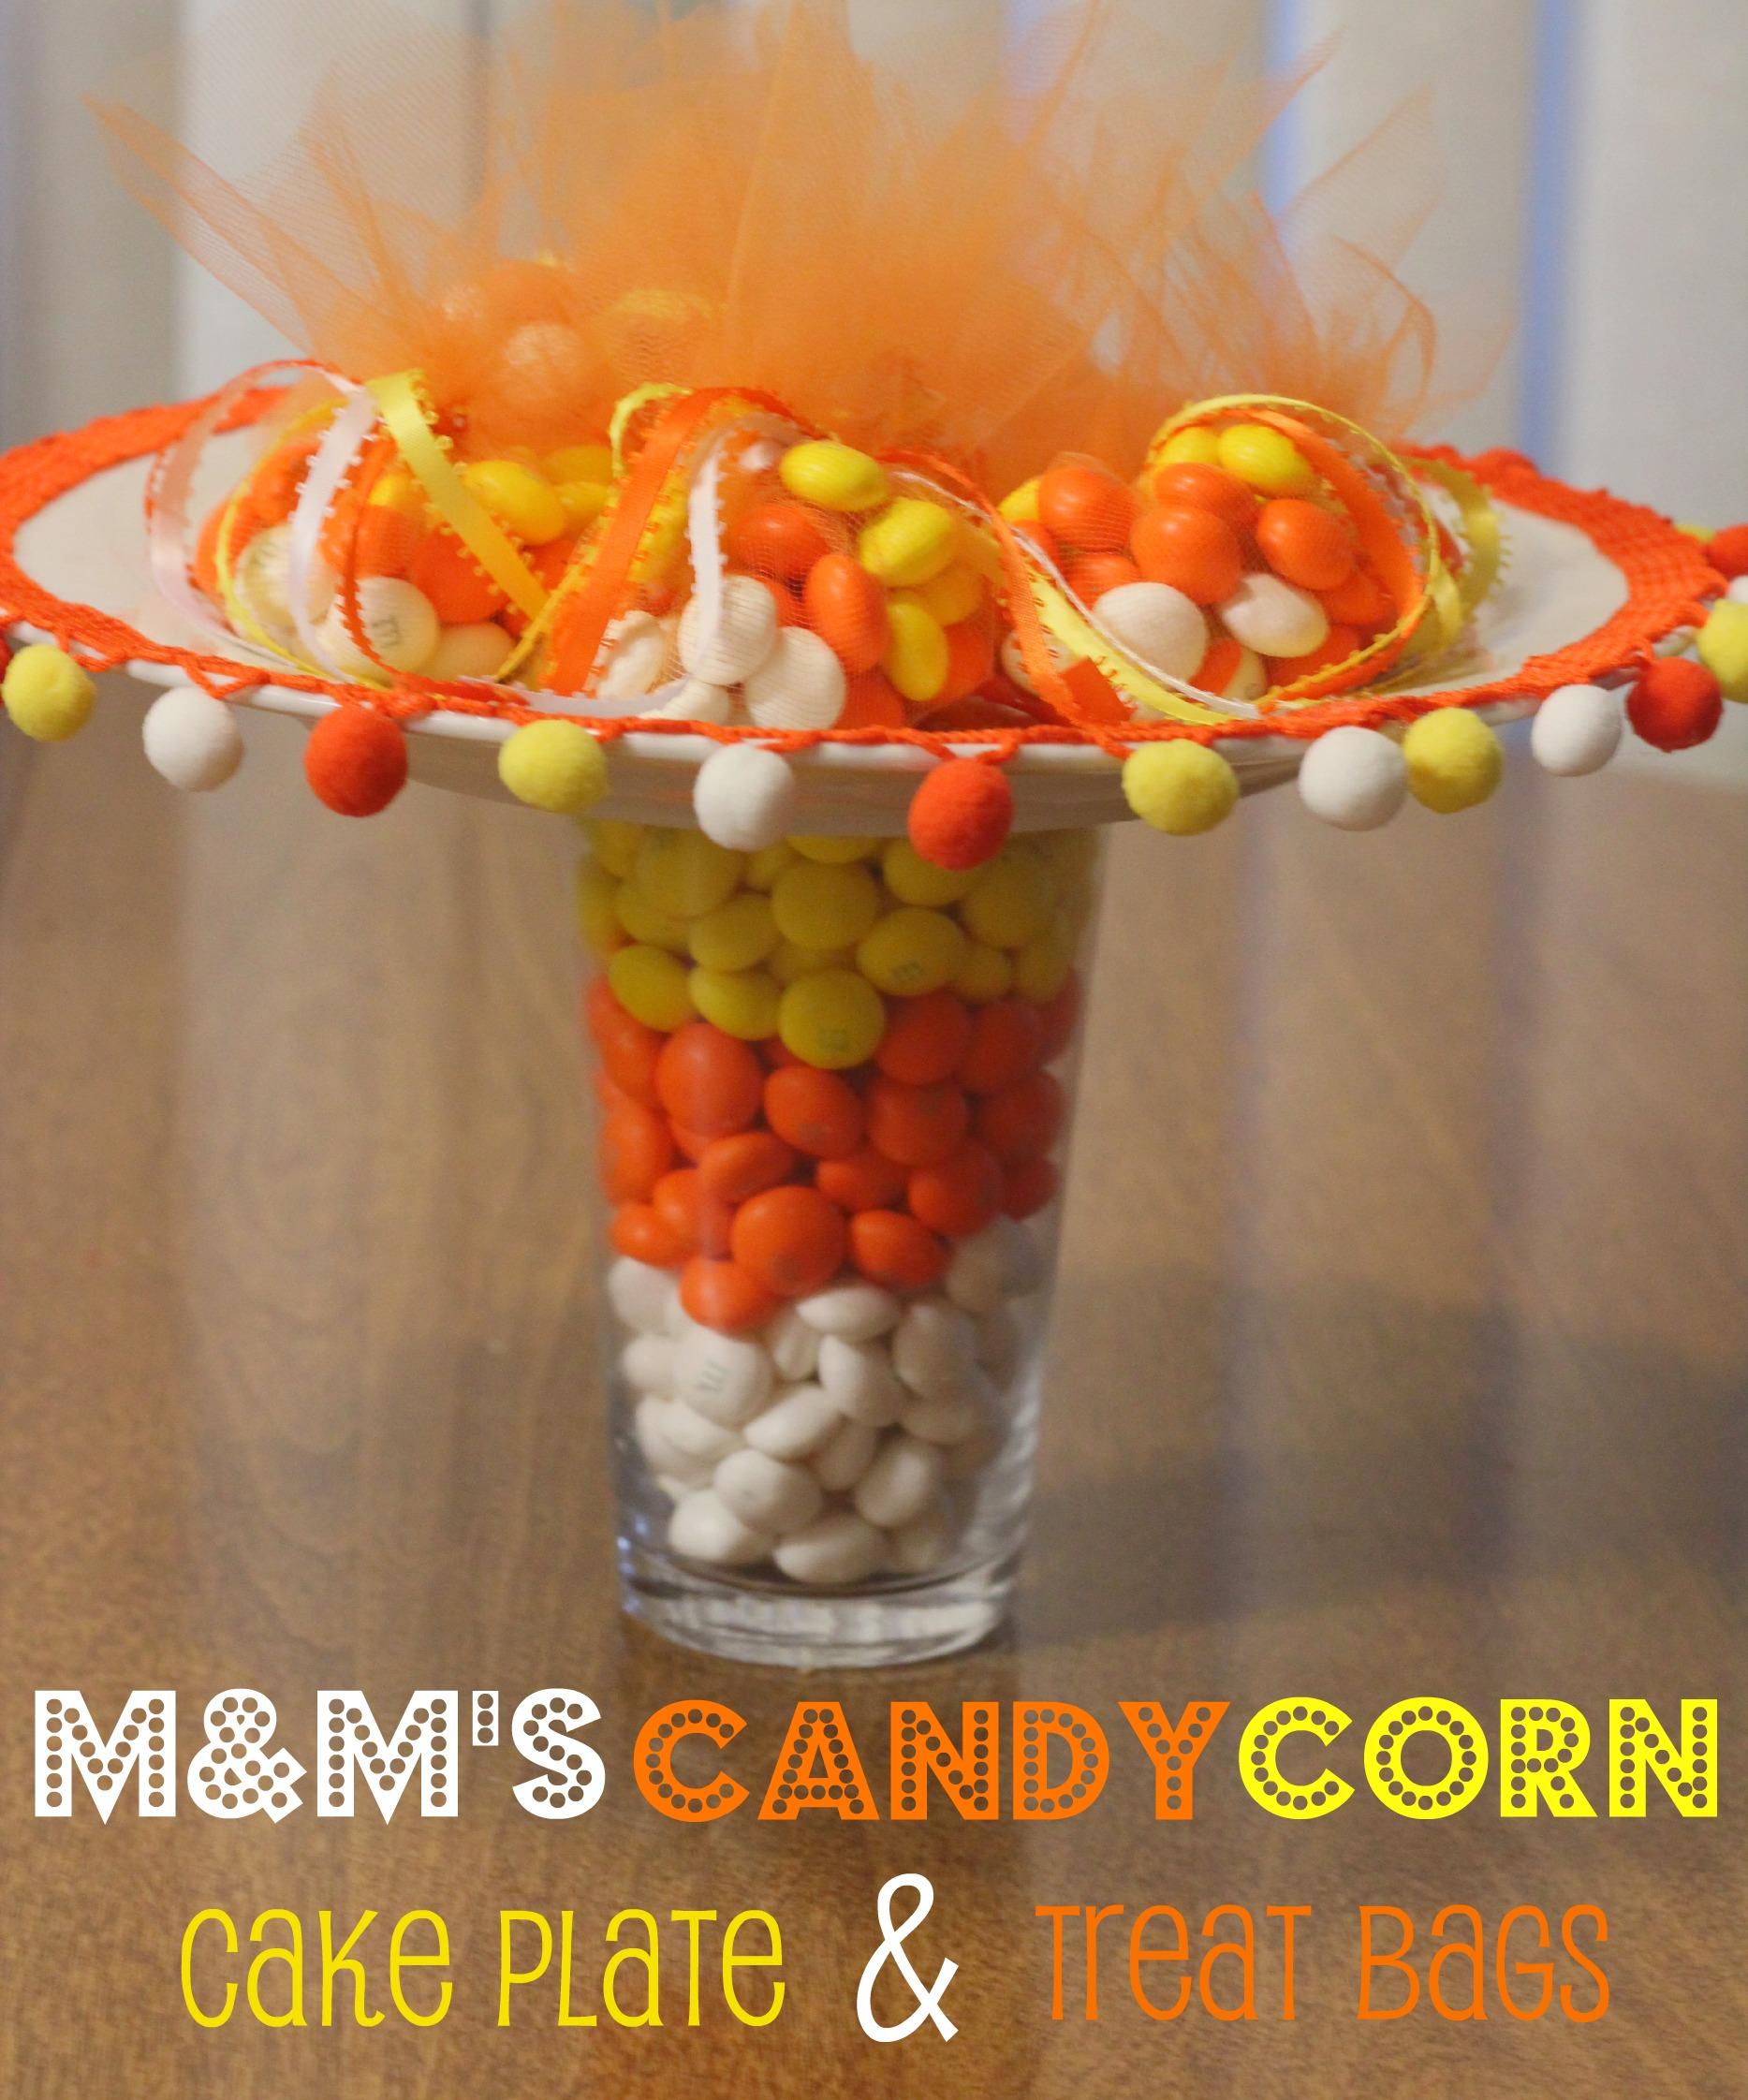 M&M's Candy Corn Cake Plate & Treat Bags #MMsGetCorny